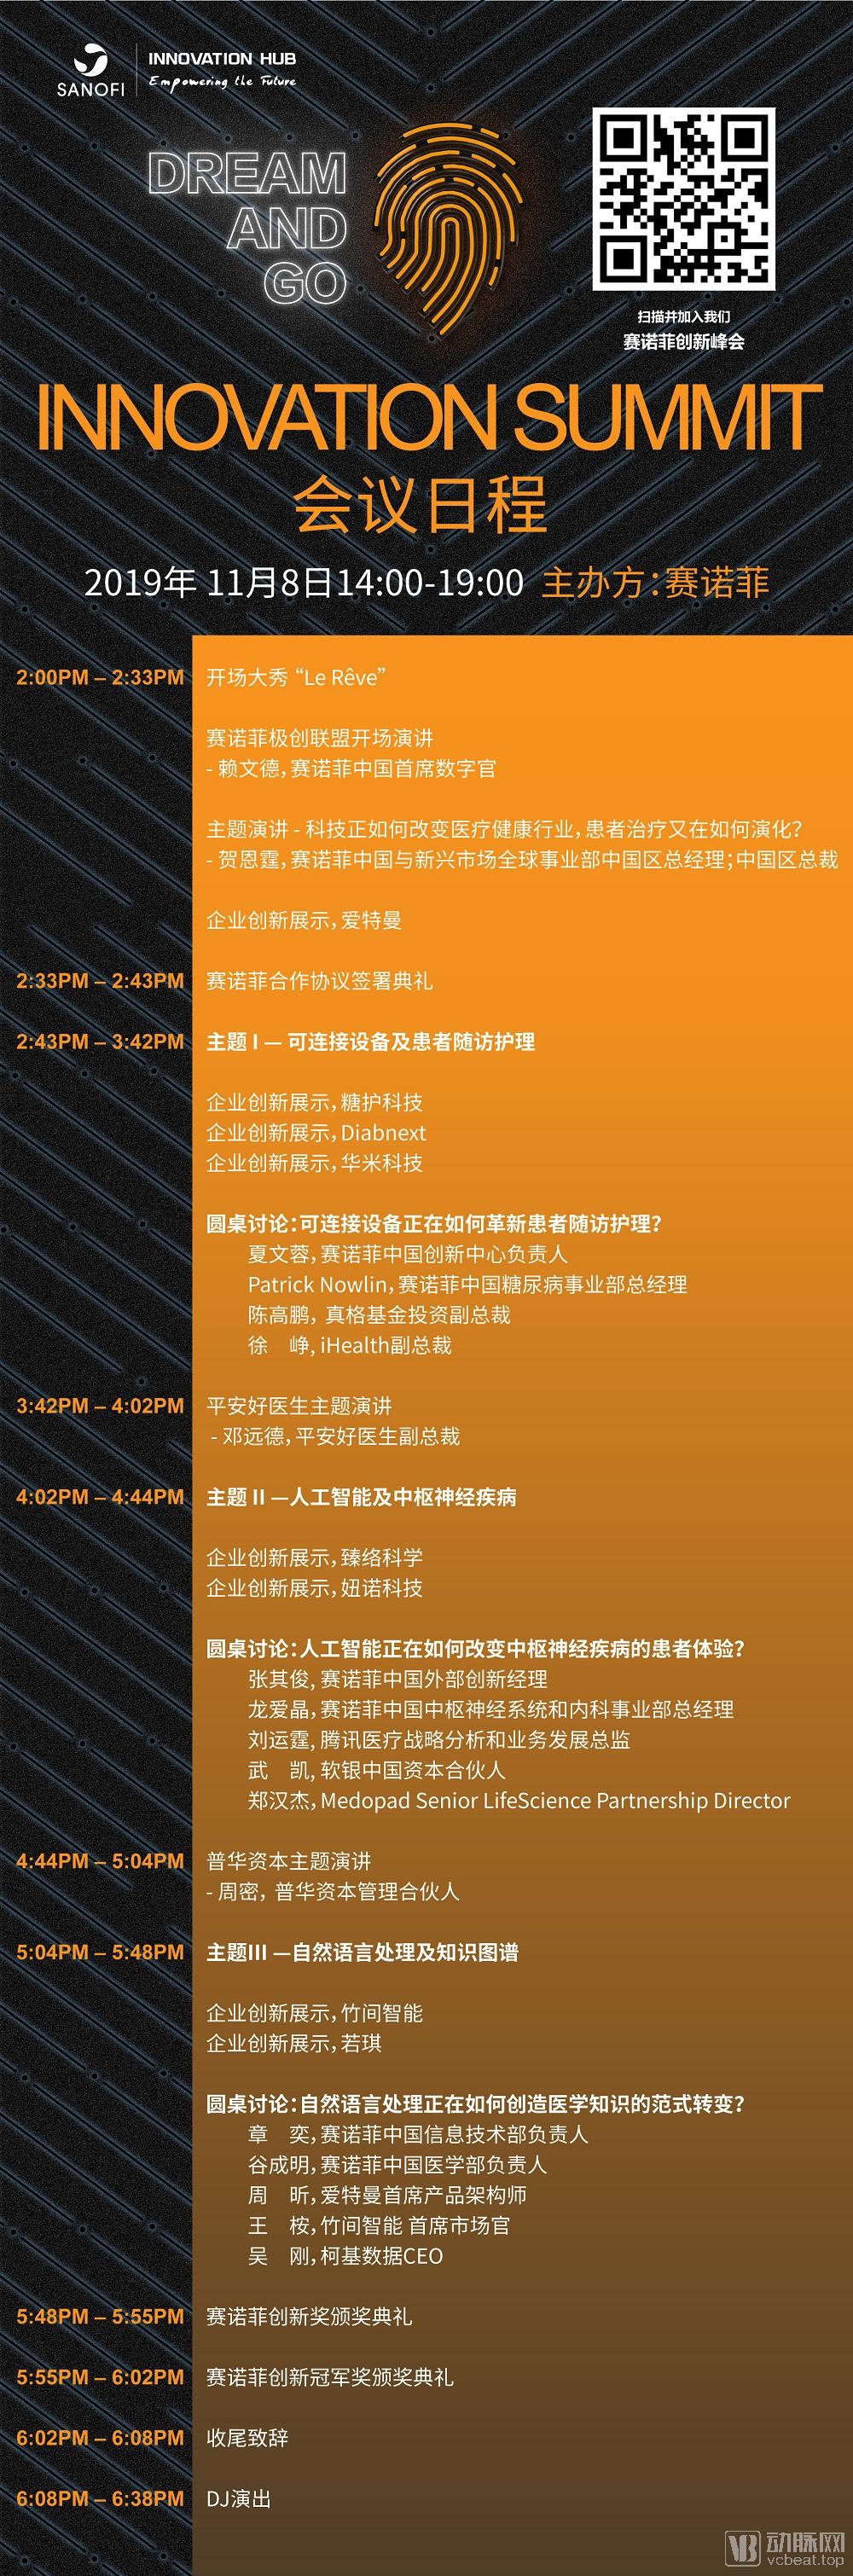 1st Sanofi Innovation Summit agenda.jpg